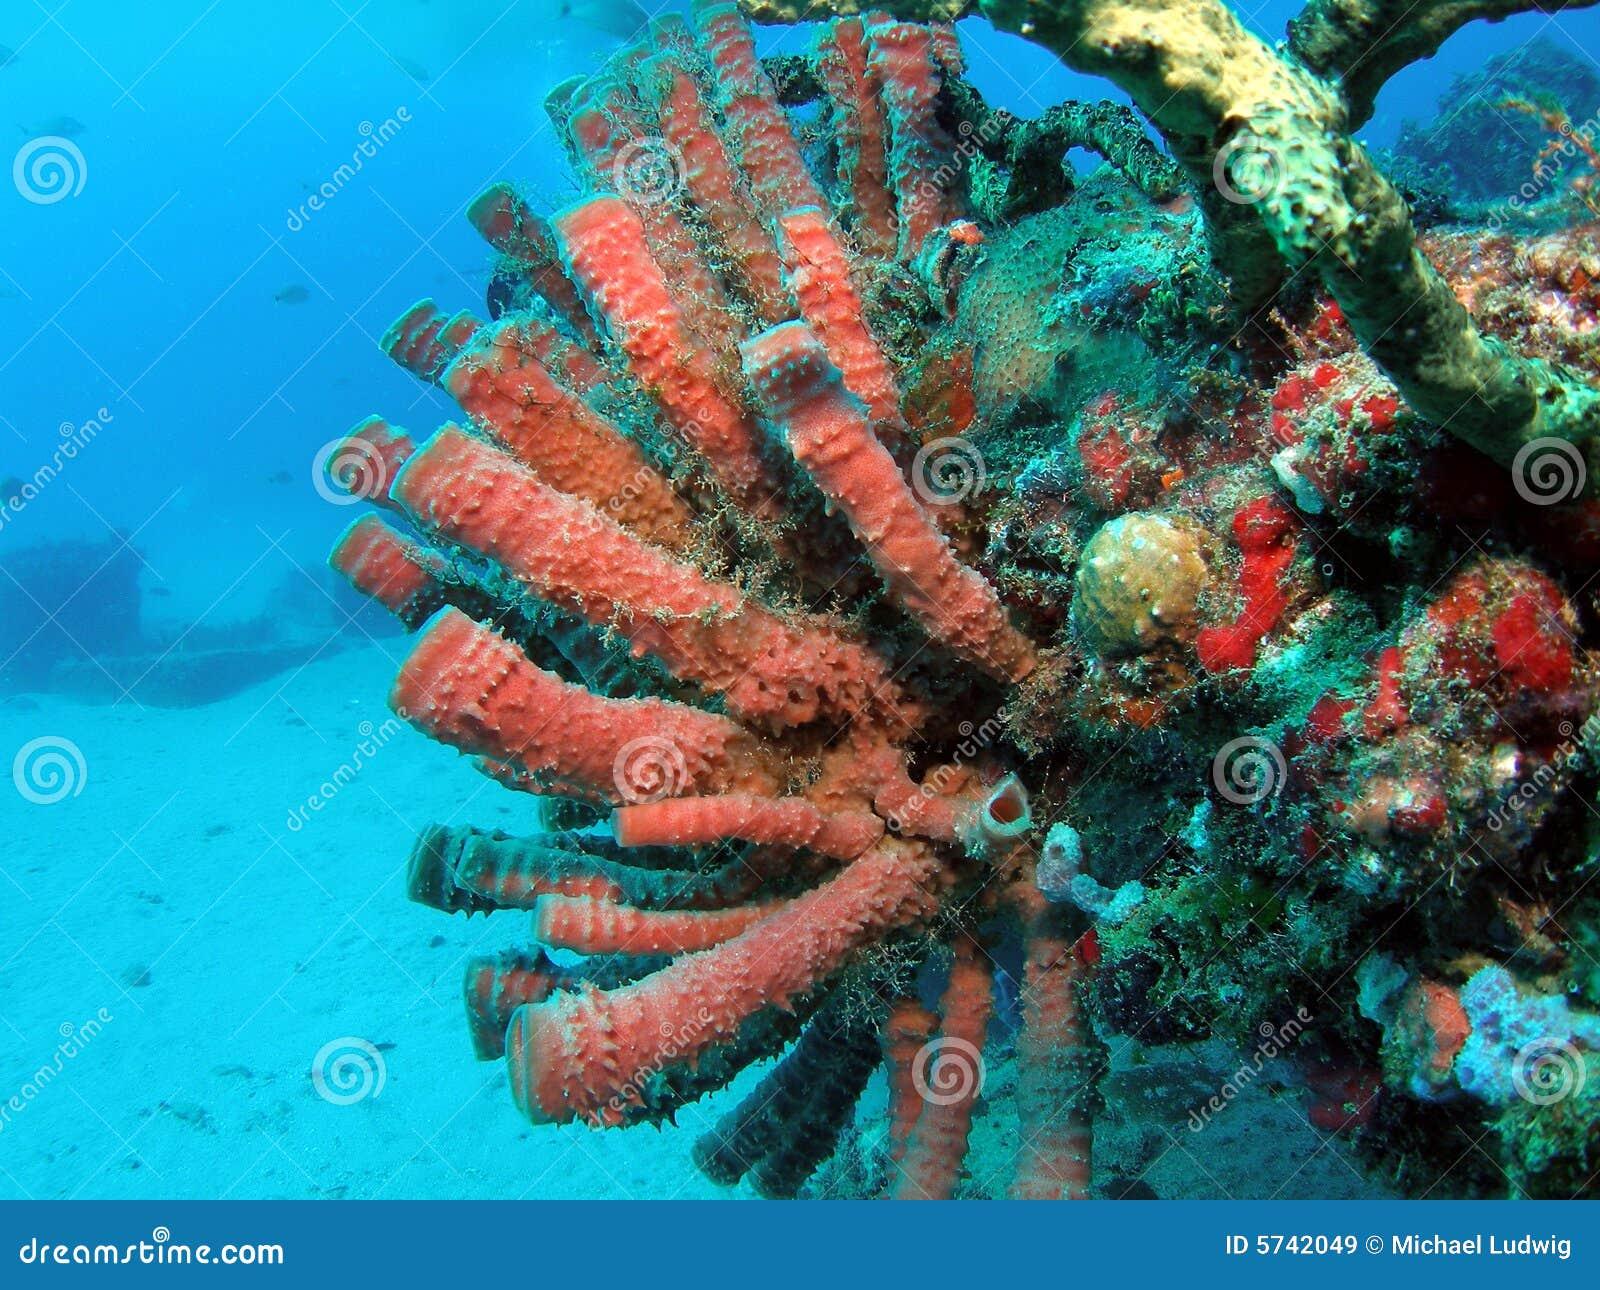 ... Zoo was taken at Barracuda Reef off the coast of Dania Beach, Florida